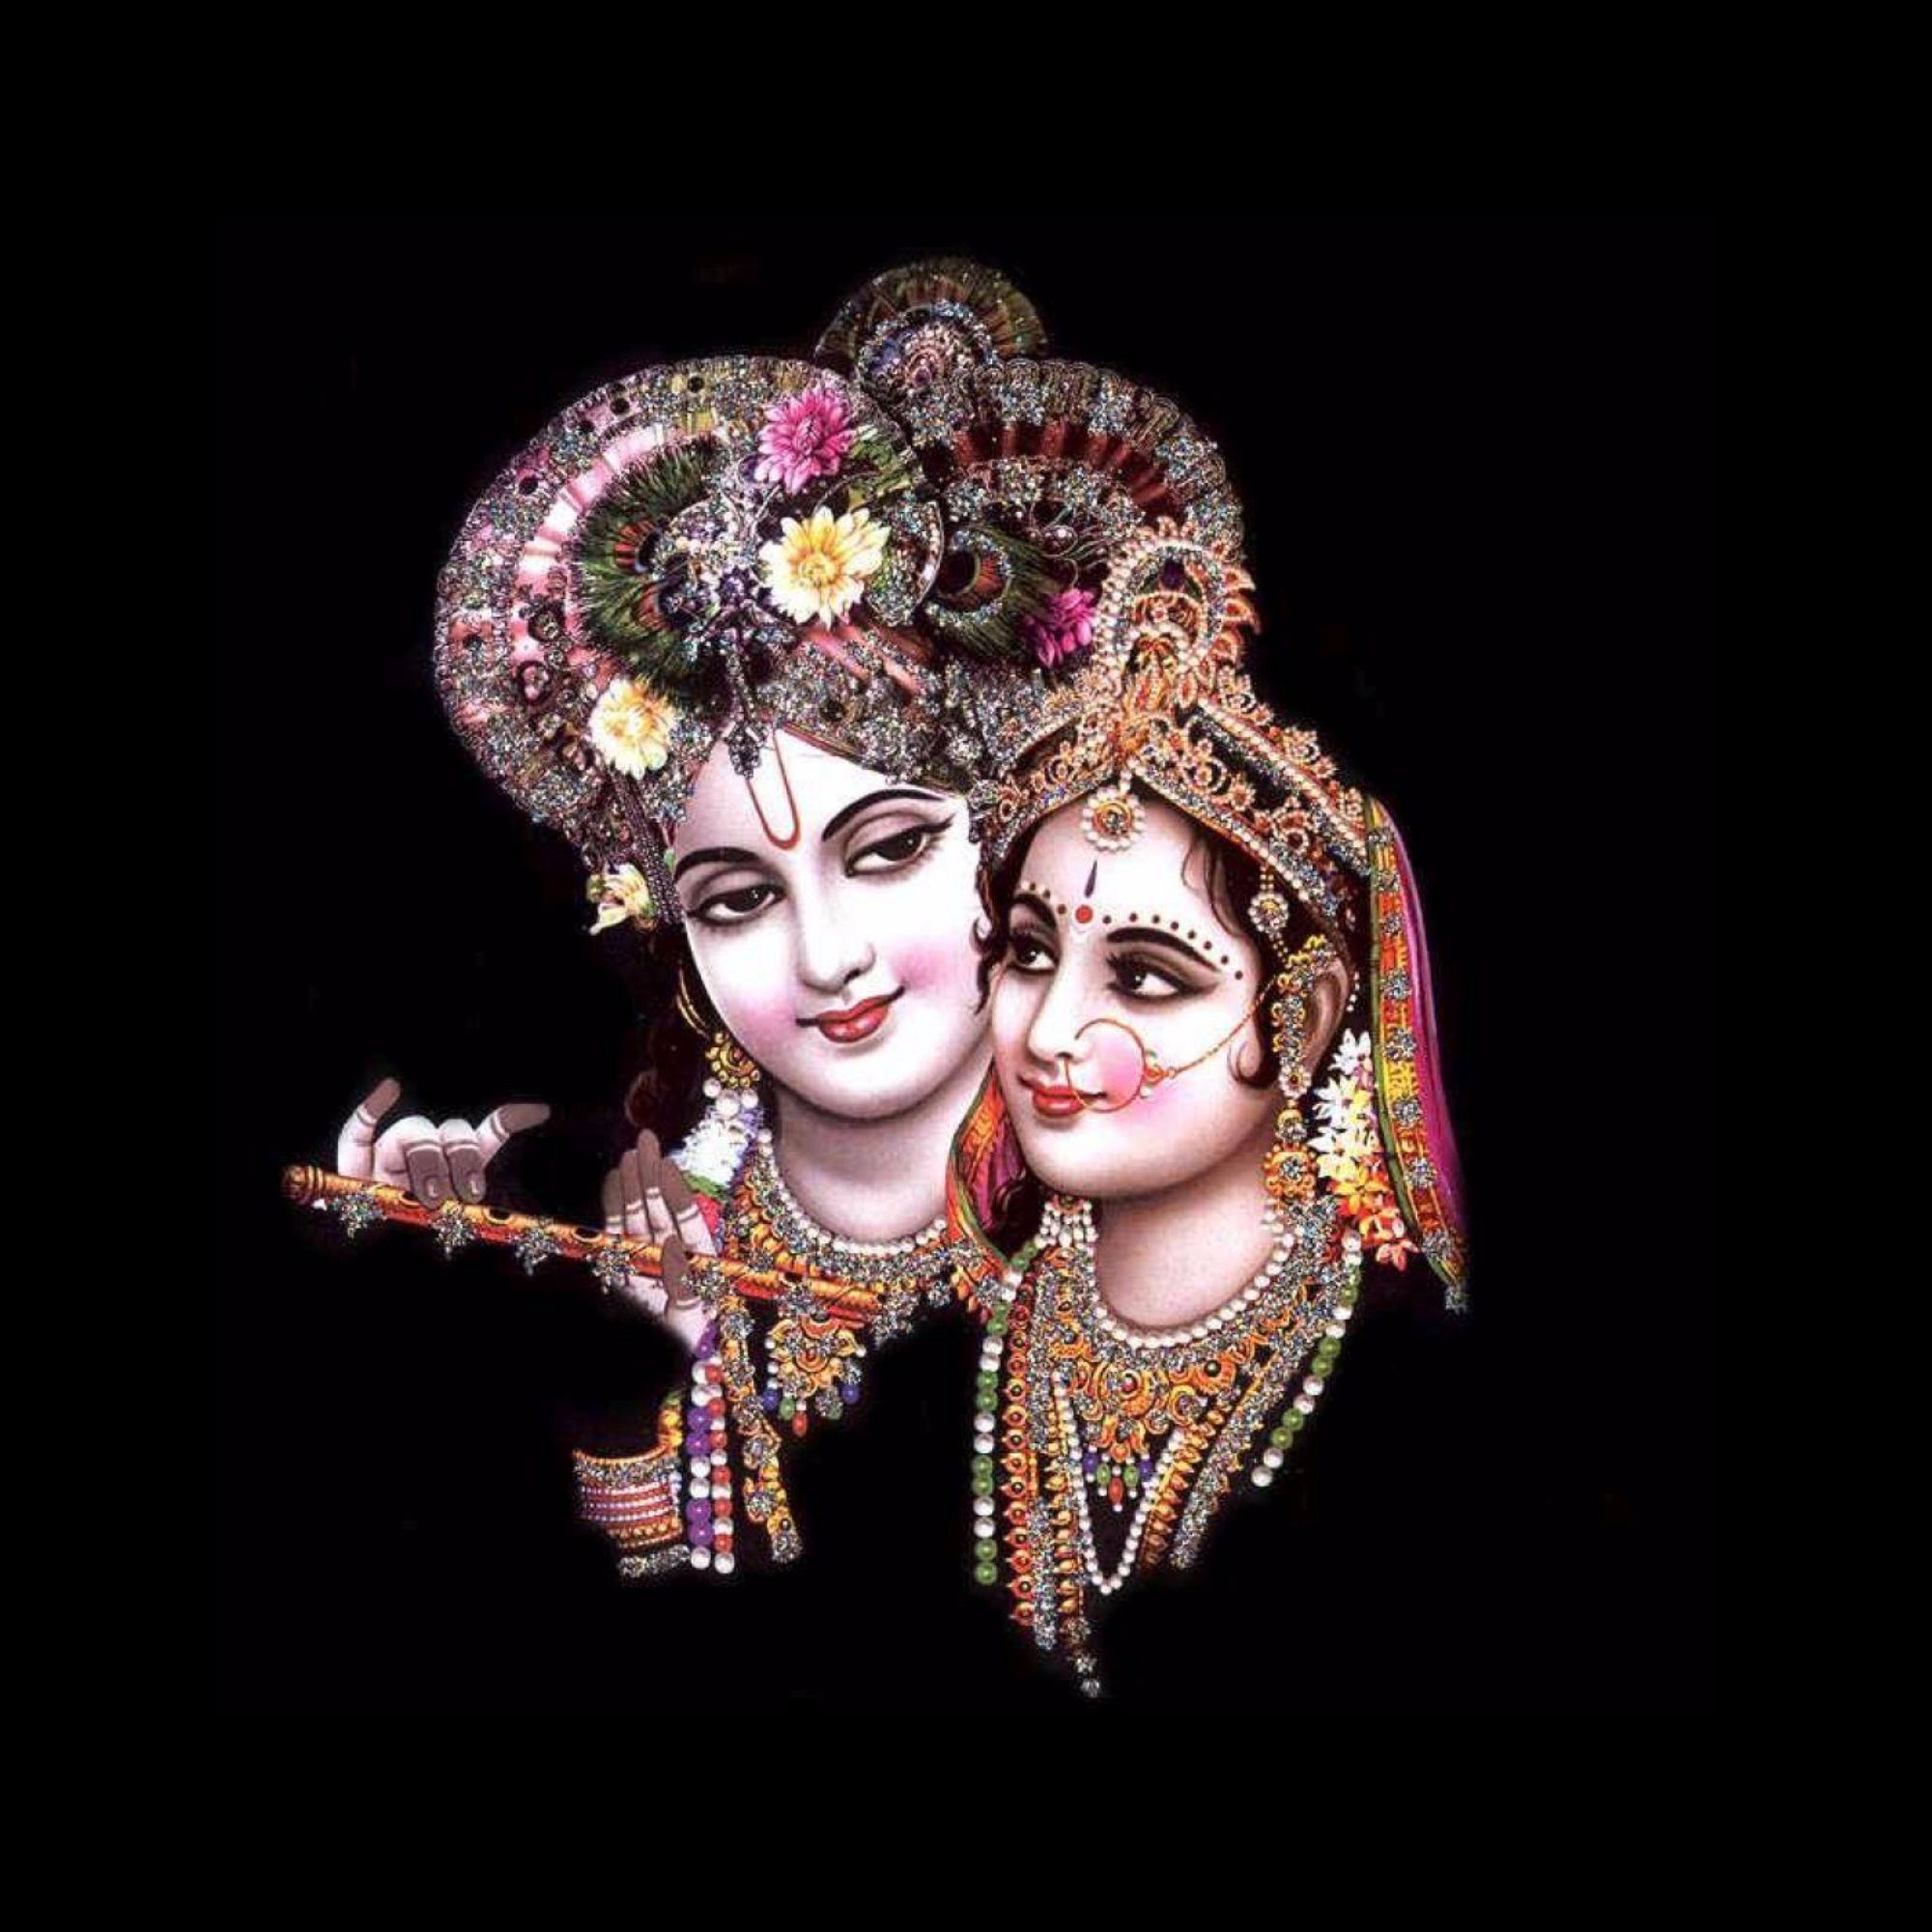 Lord krishna wallpaper 2018 44 images - Krishna god pic download ...